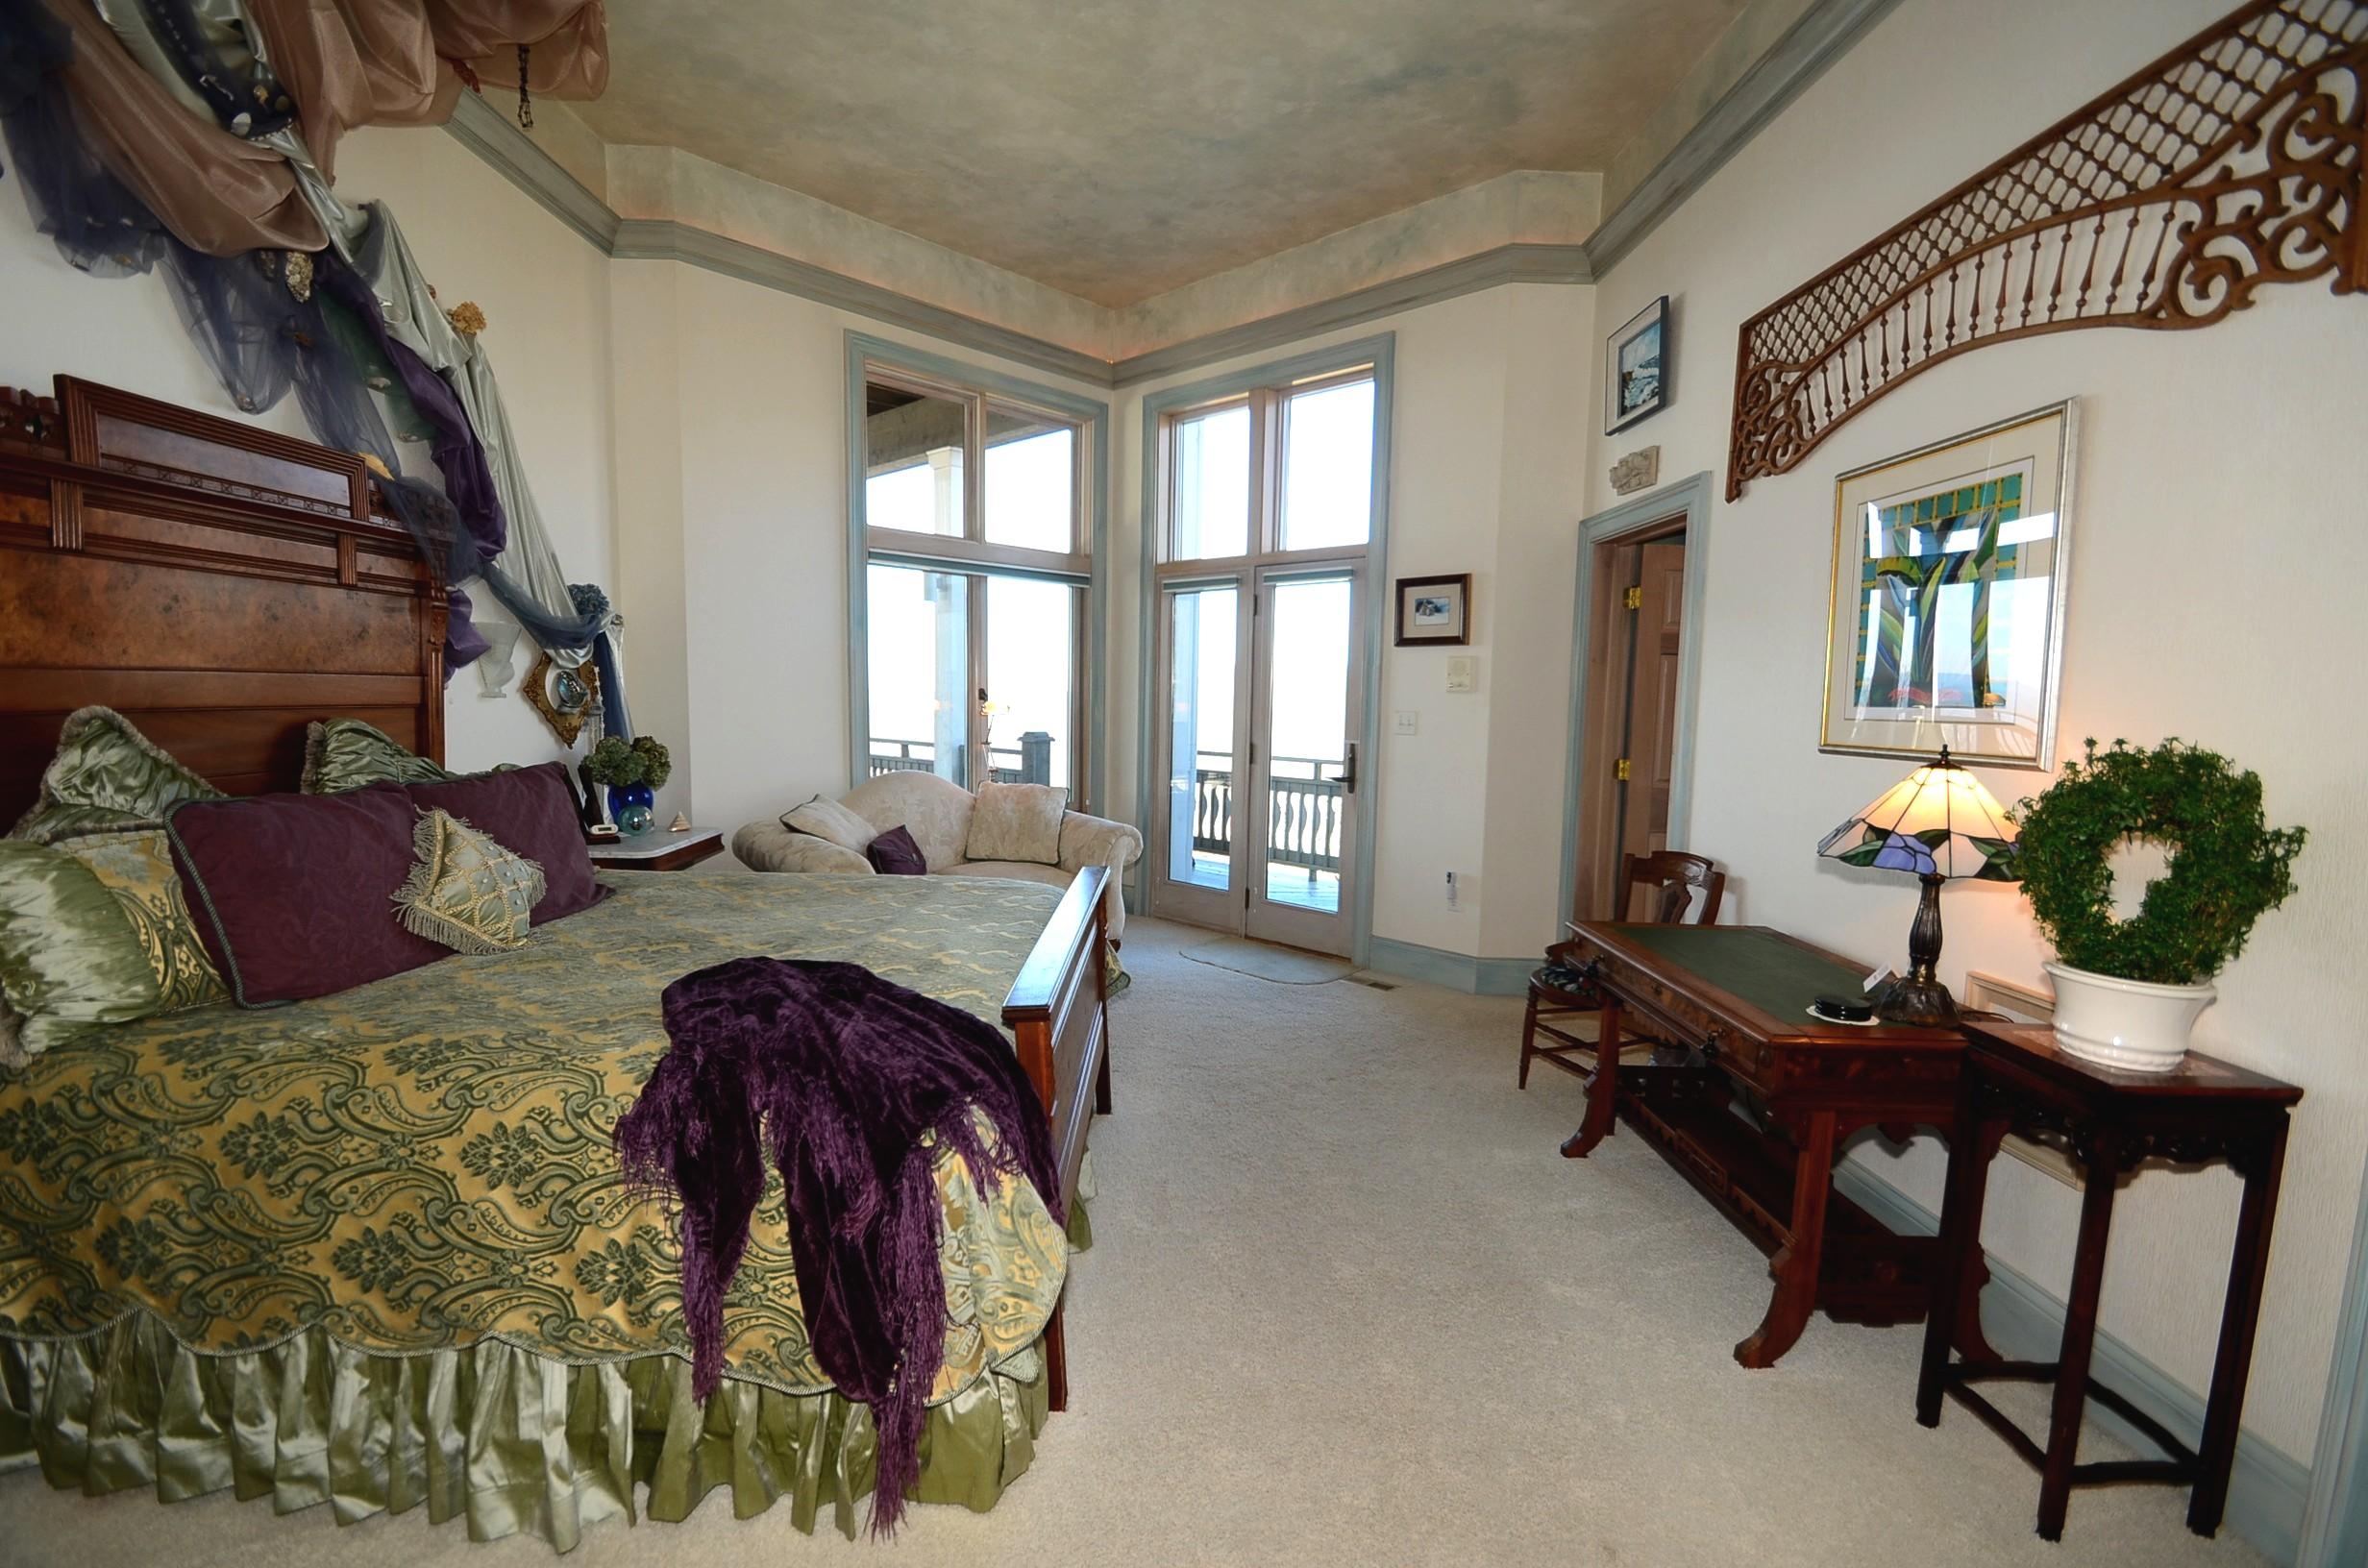 Tremendous Smoky Mountain Bed And Breakfast Near Gatlinburg Tennessee Interior Design Ideas Clesiryabchikinfo